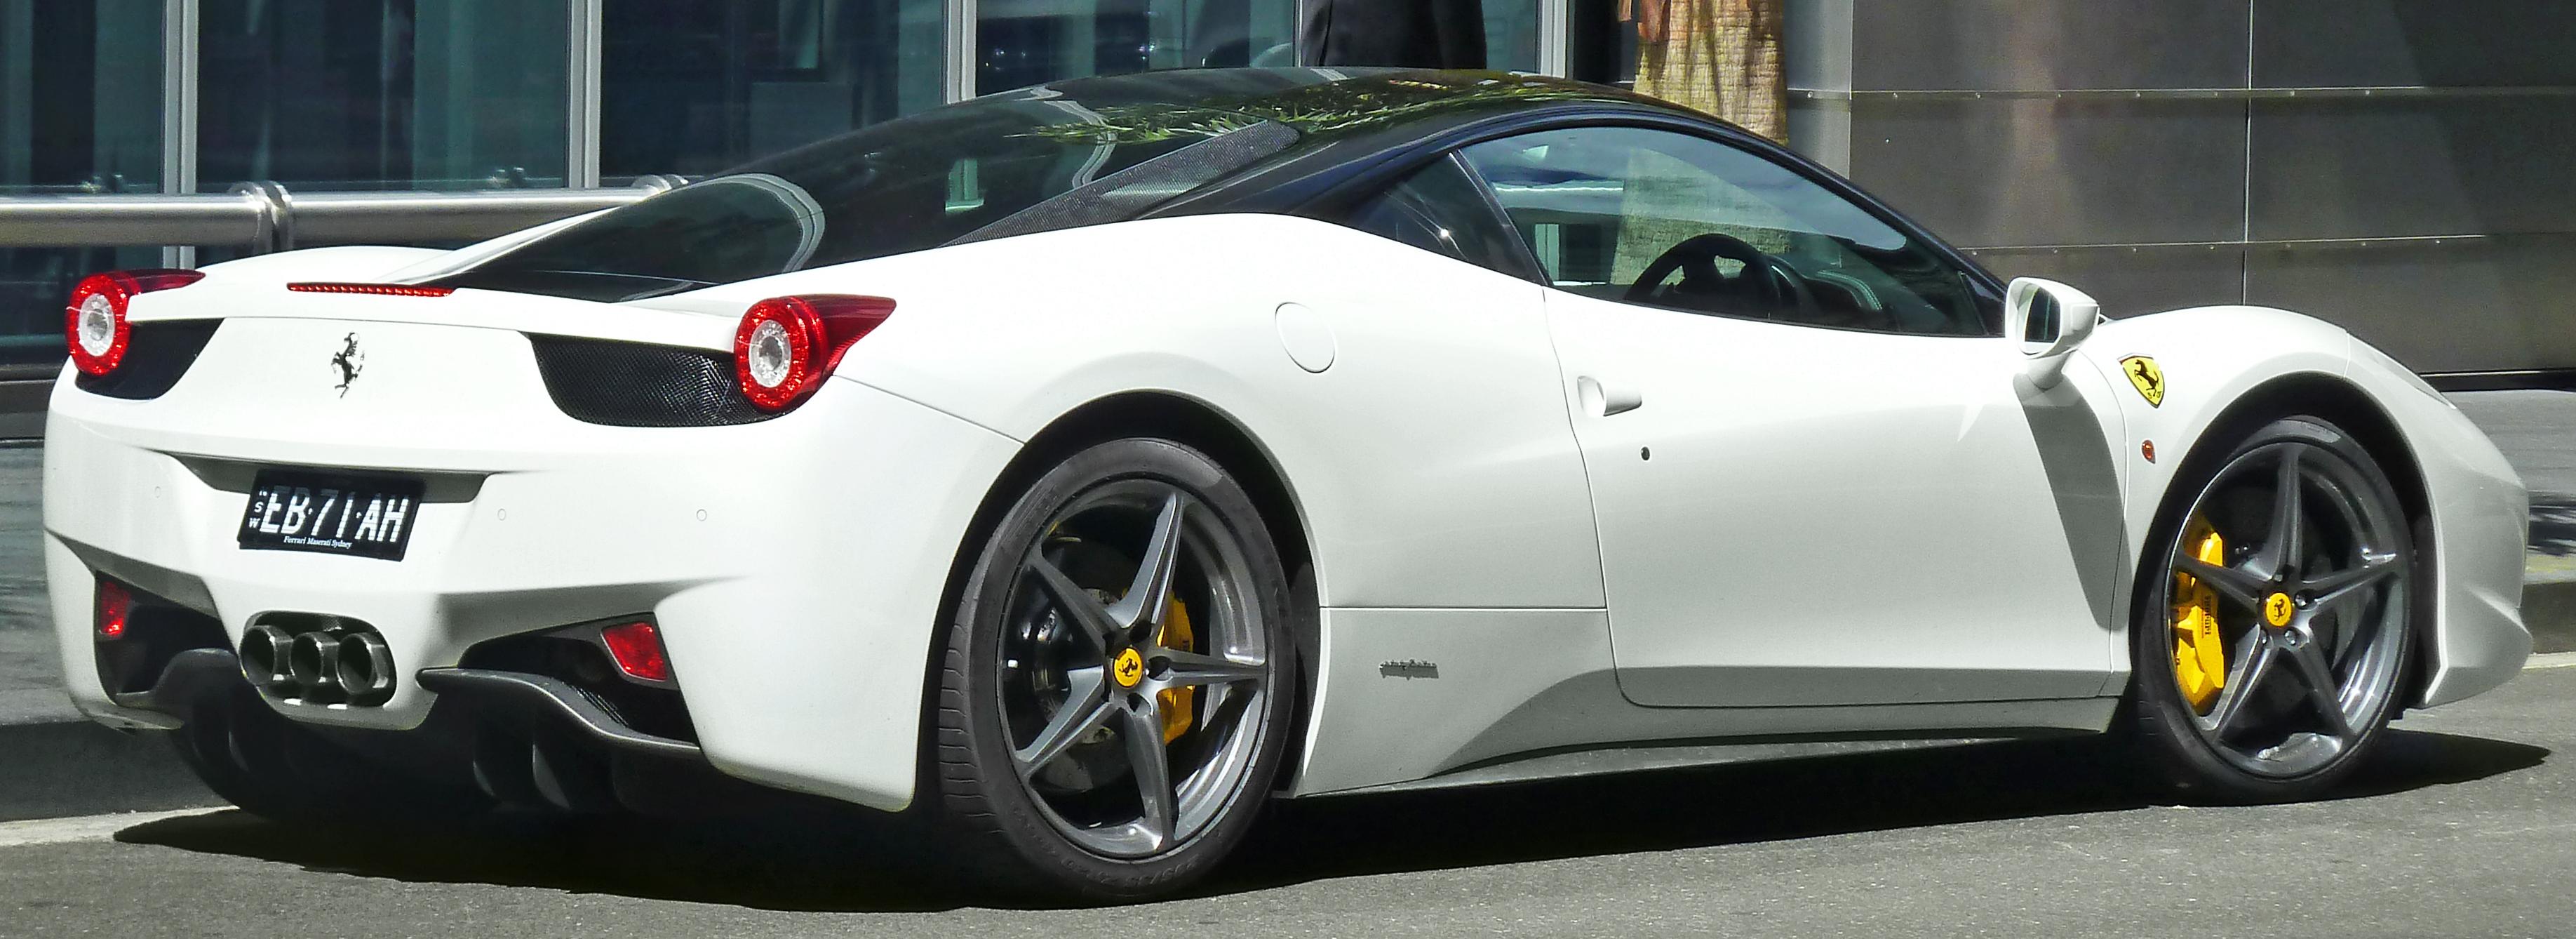 File 2010 2011 Ferrari 458 Italia Coupe 2011 03 23 03 Jpg